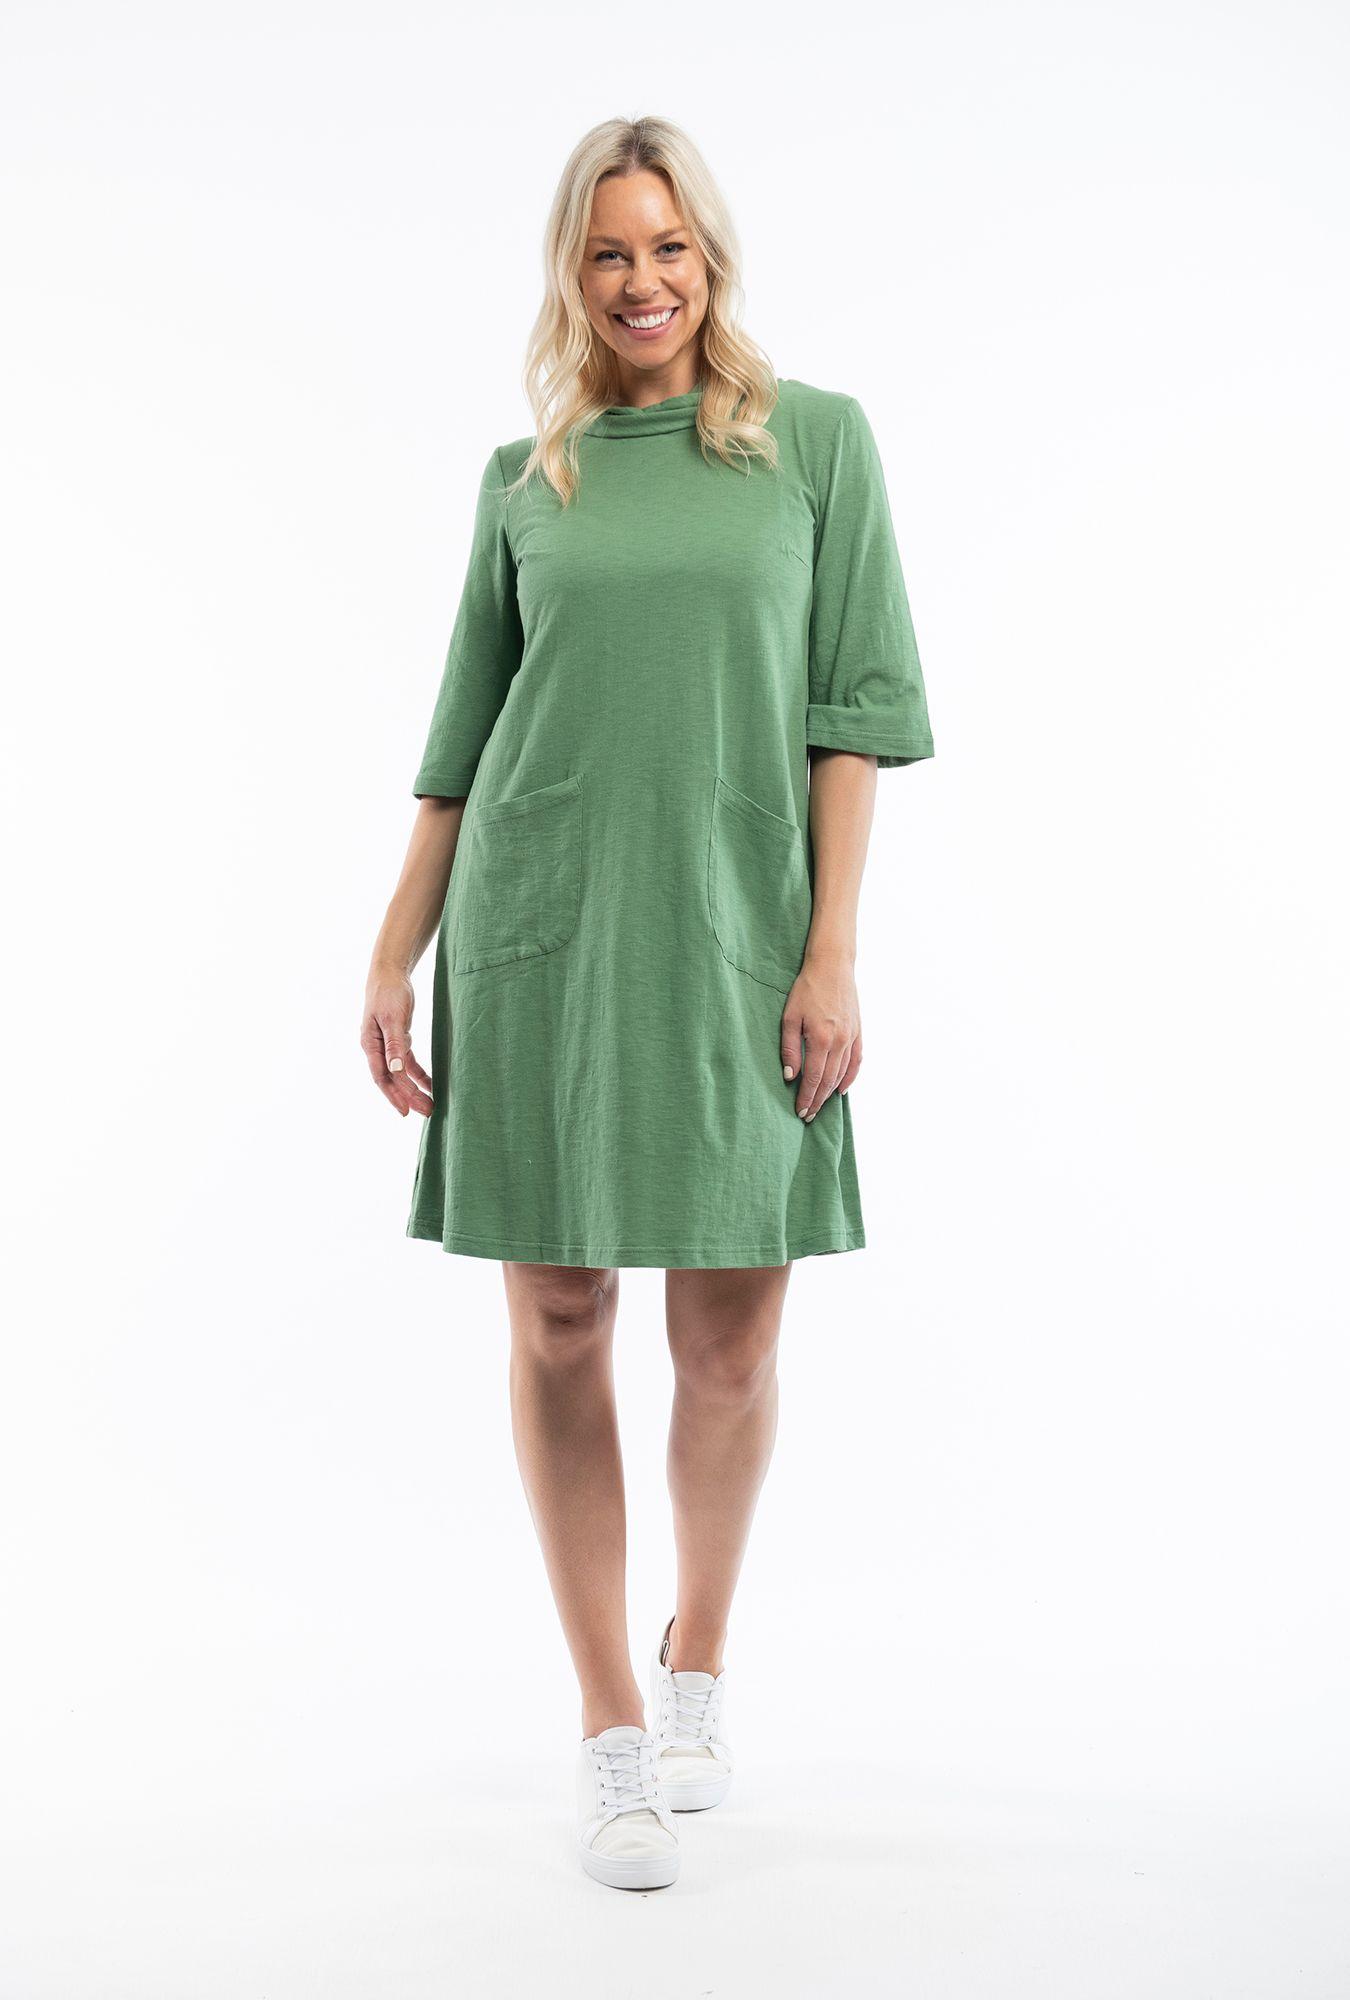 Olive Cowel Dress